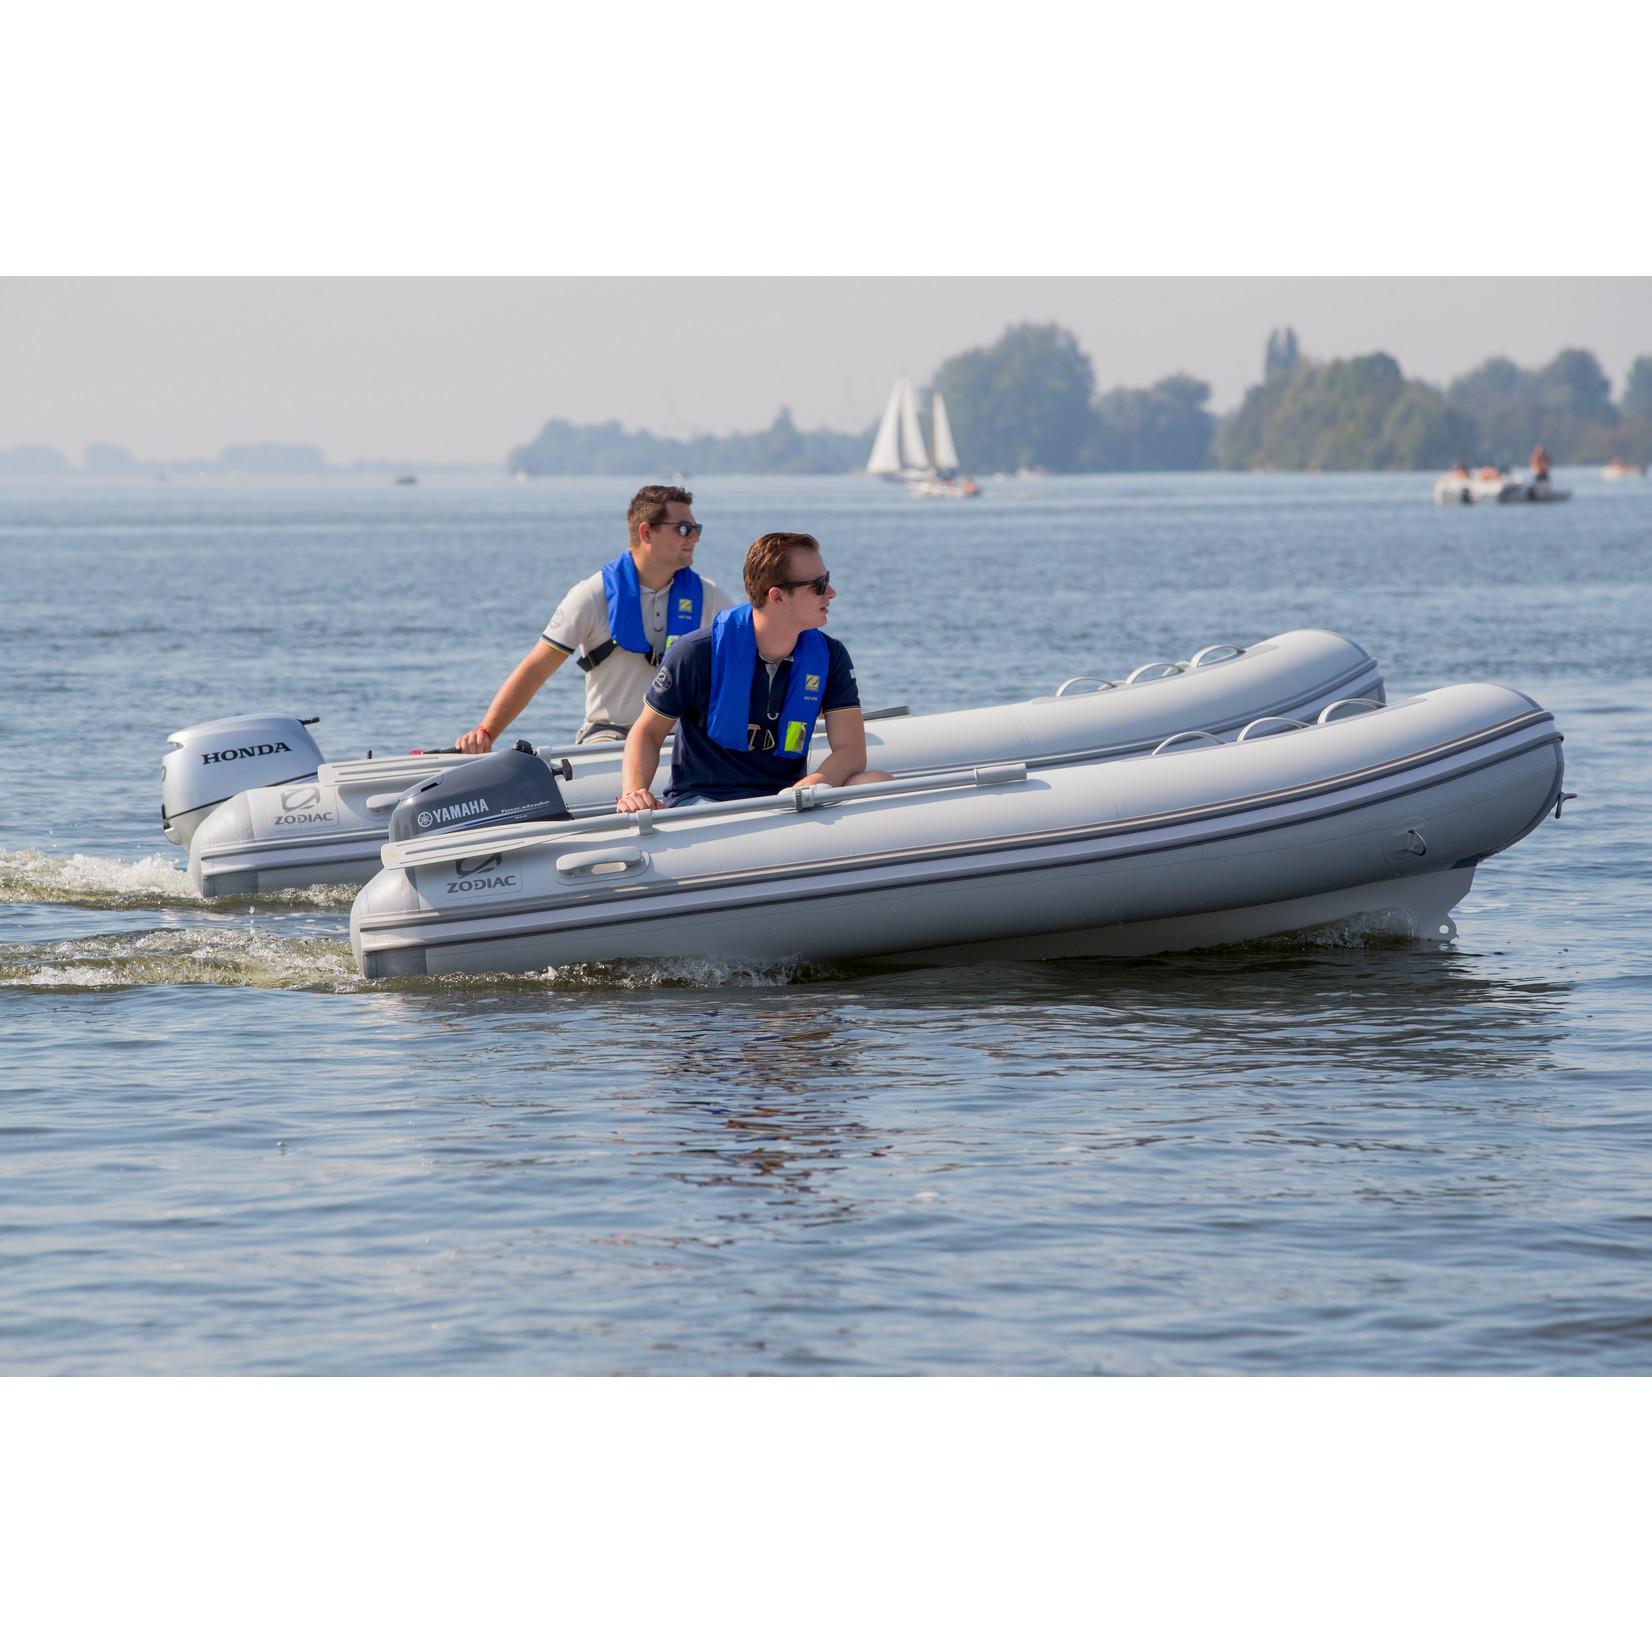 Zodiac Cadet 300 ALU RIB - single deck